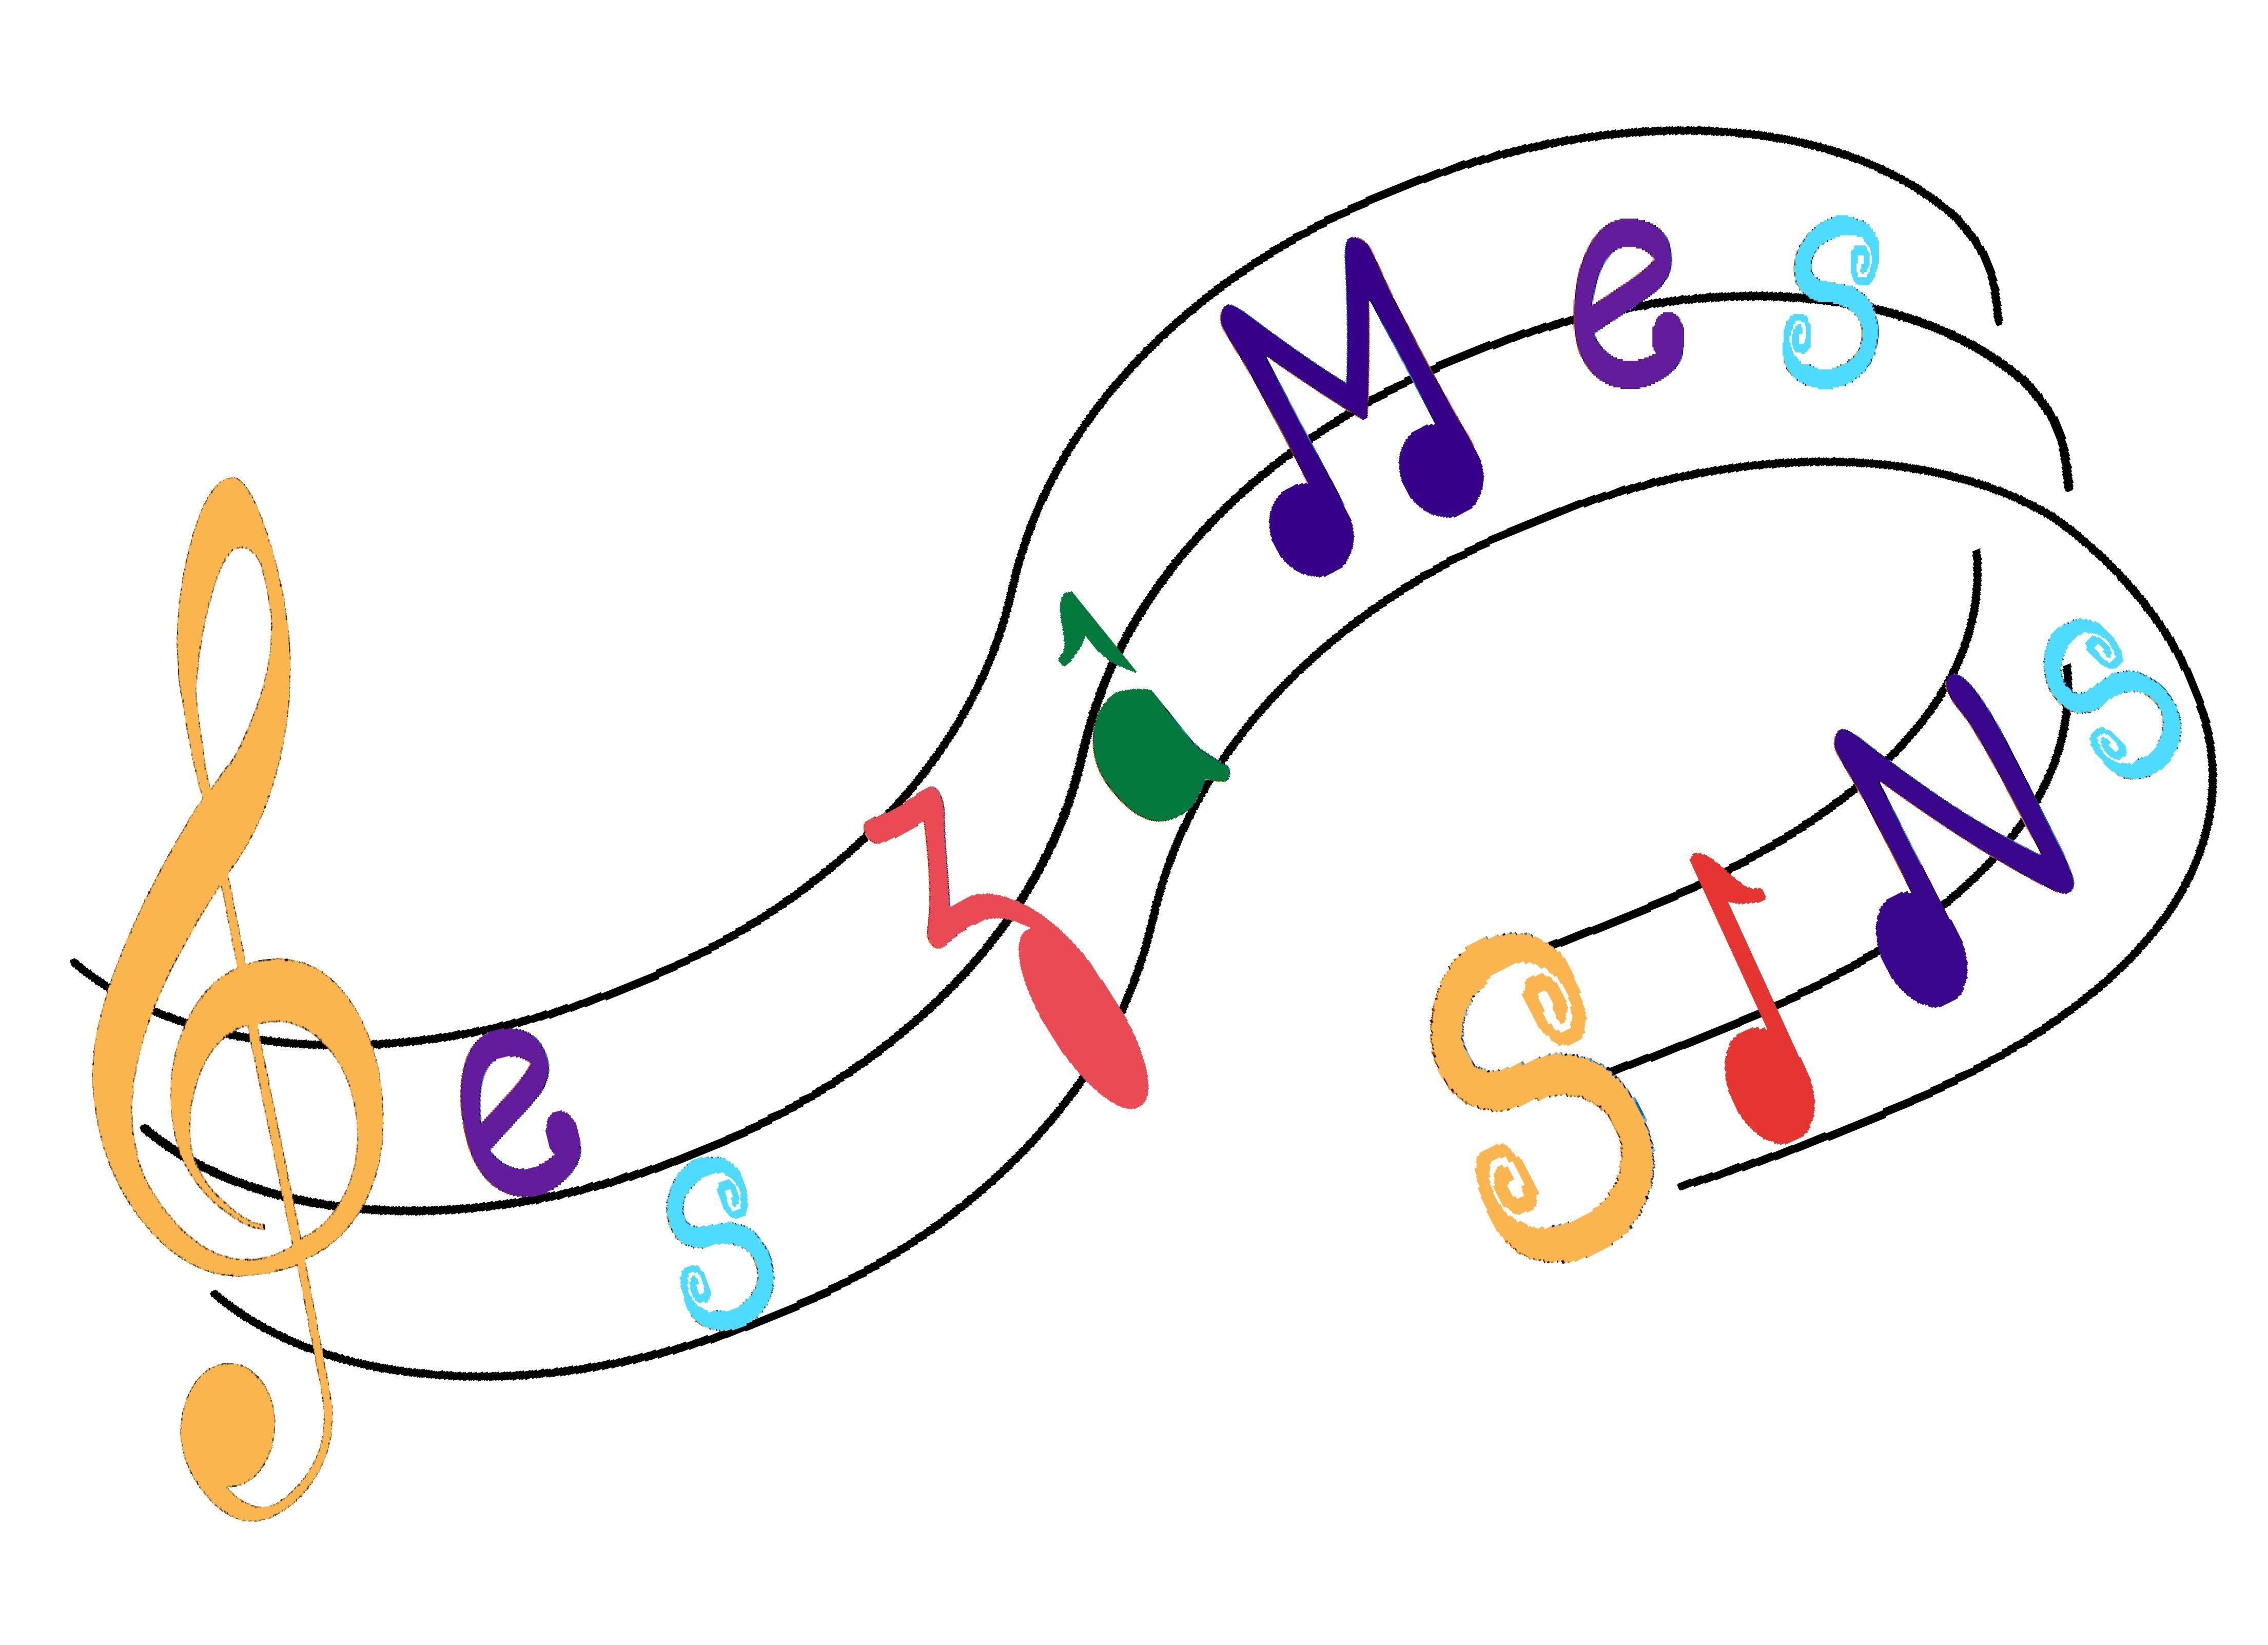 cropped-logo-les-zames-sons-version-1-nettoye.jpg